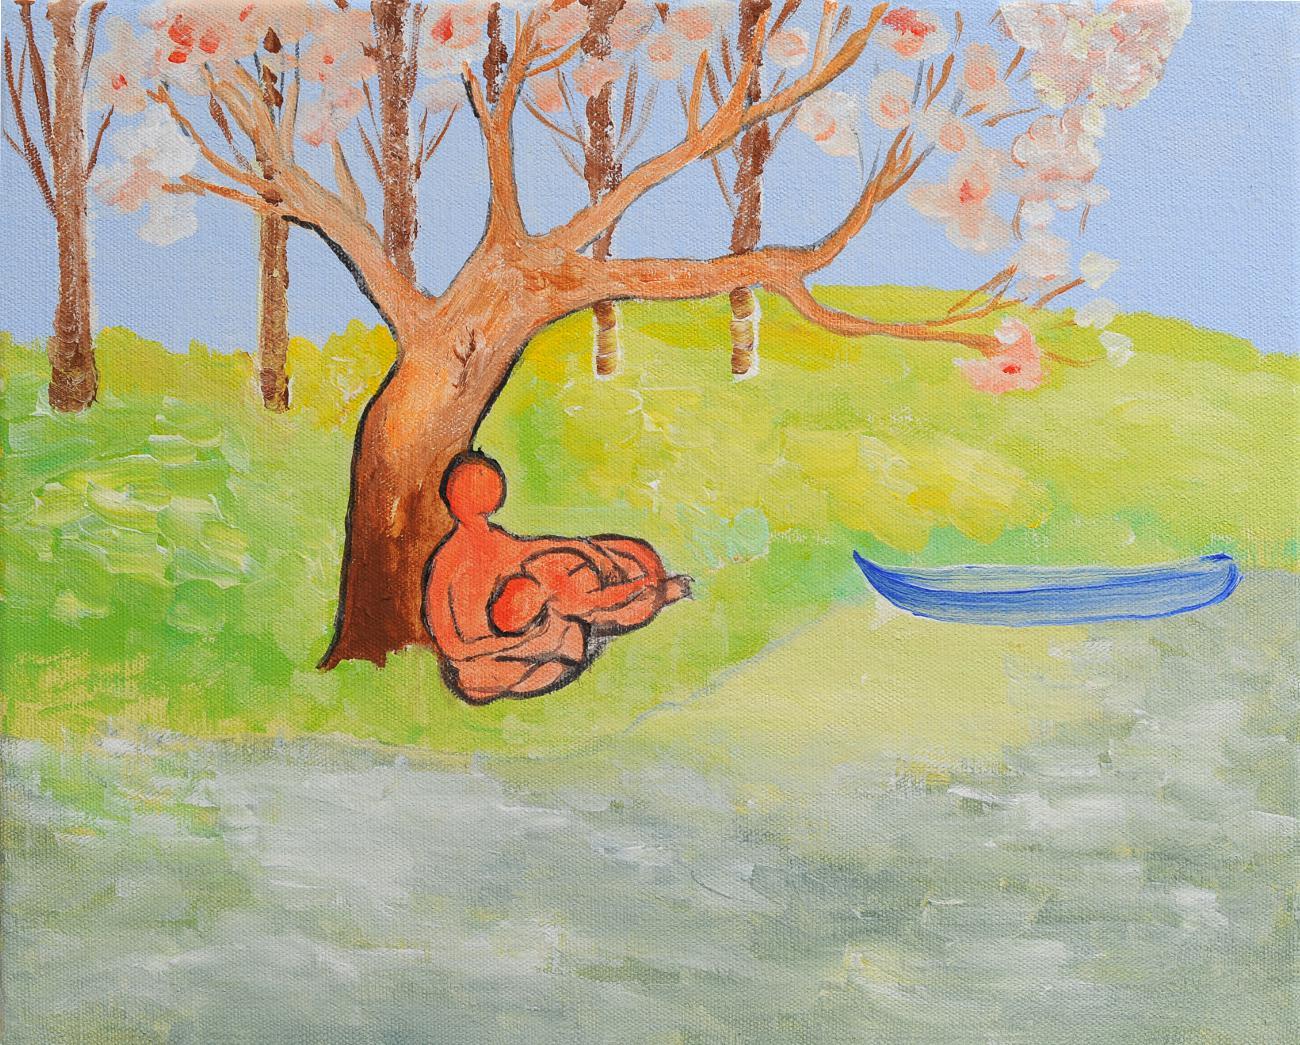 Jan Karpíšek: Love, acryl on canvas, 40x50 cm, 2011, Gallery of Visual Arts in Hodonín